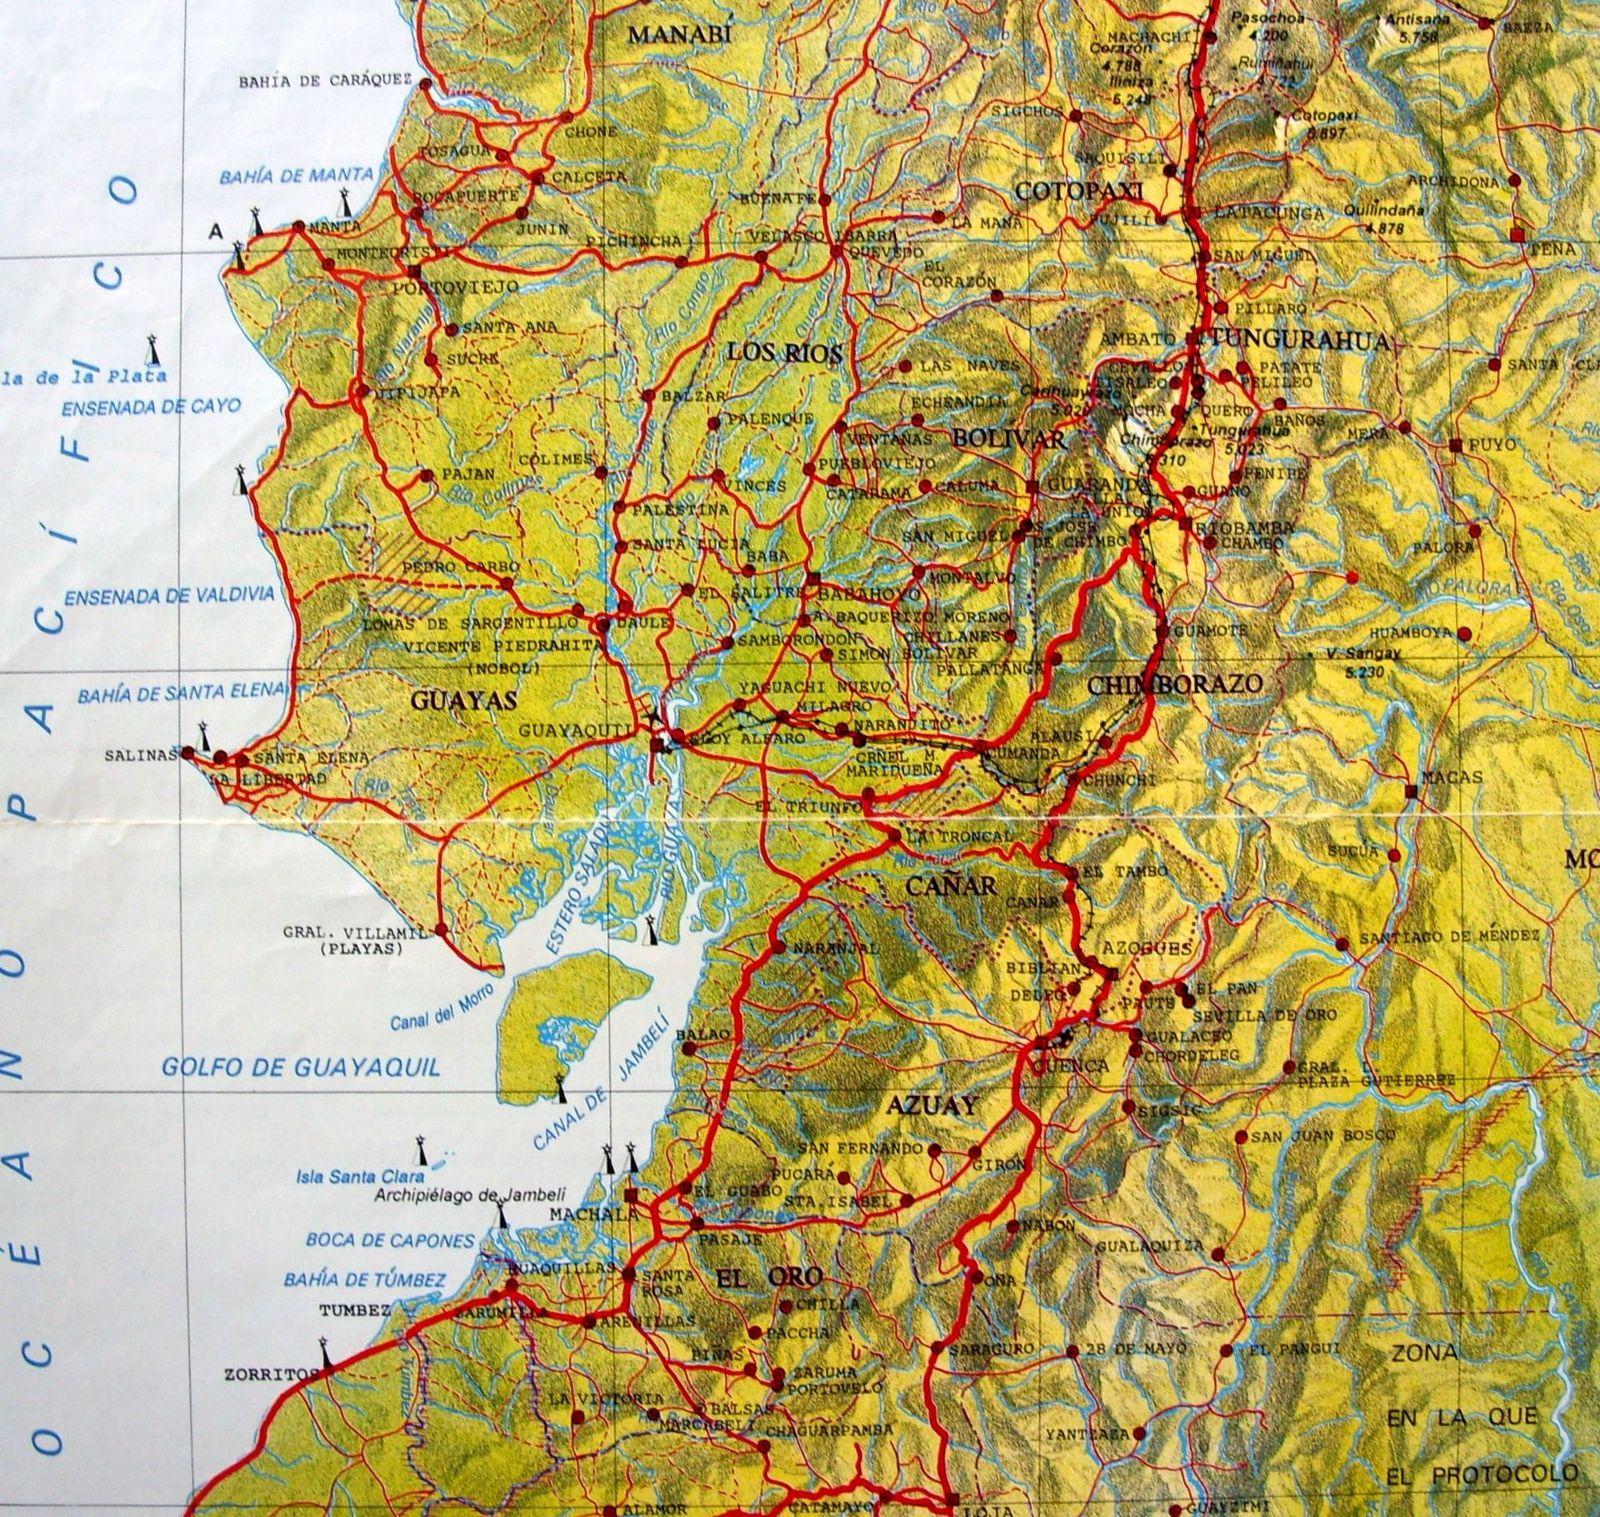 Relieve del Ecuador Map Guayaquil Ecuador mappery